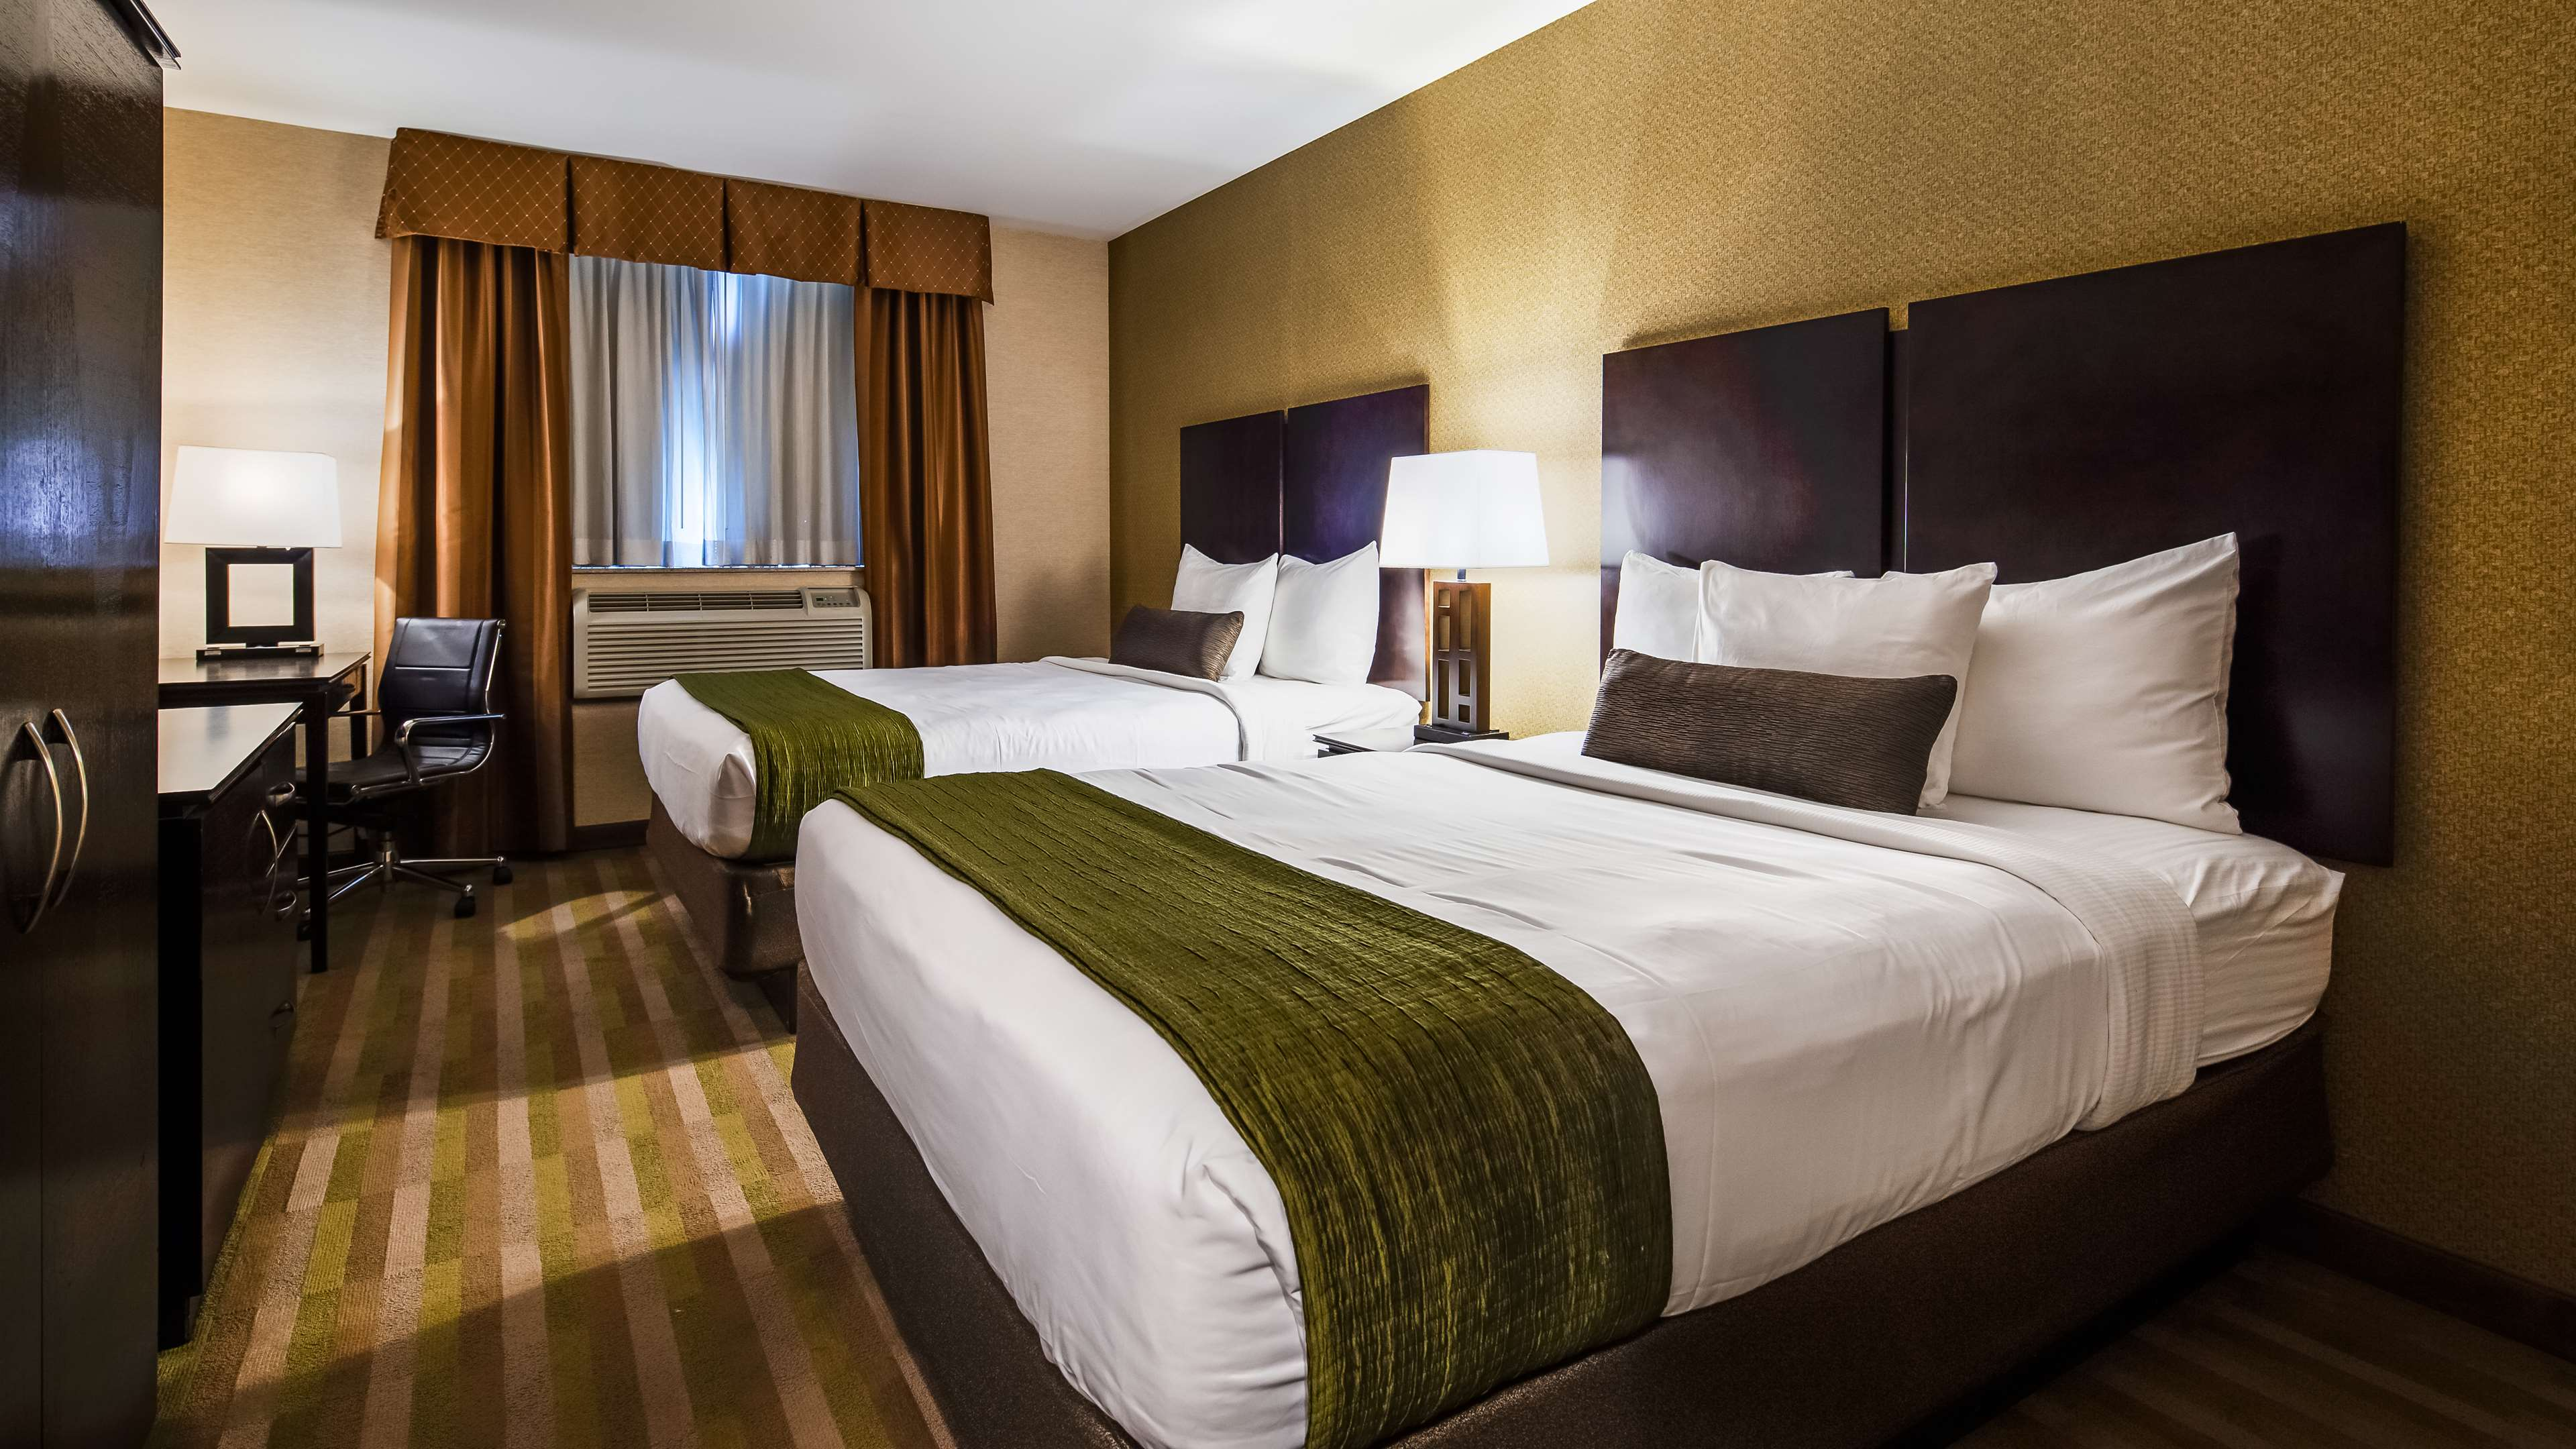 Best Western Plus Plaza Hotel image 19